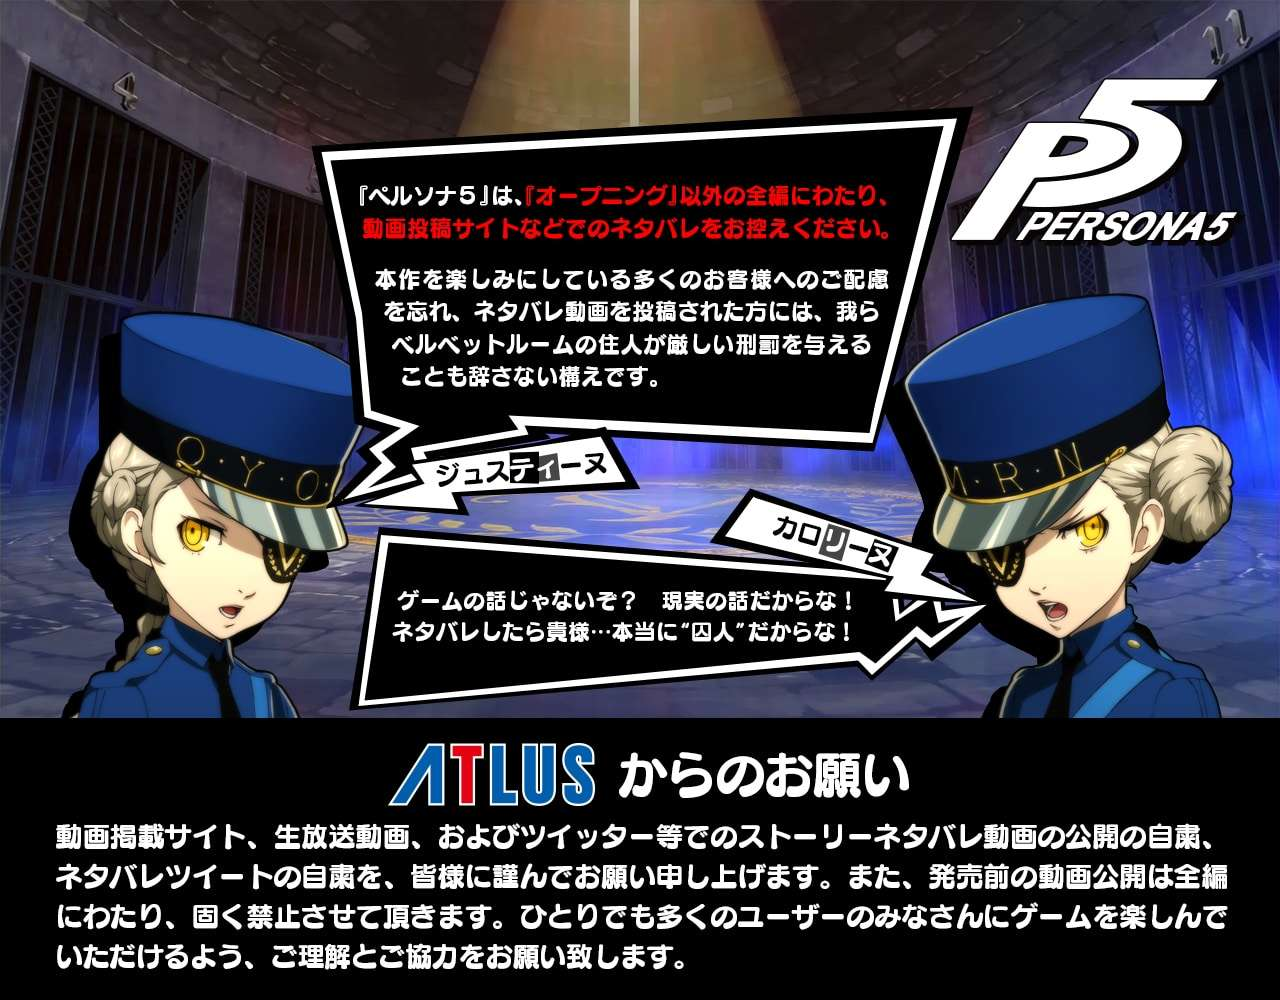 Persona-5-Spoiler-Warning.jpg